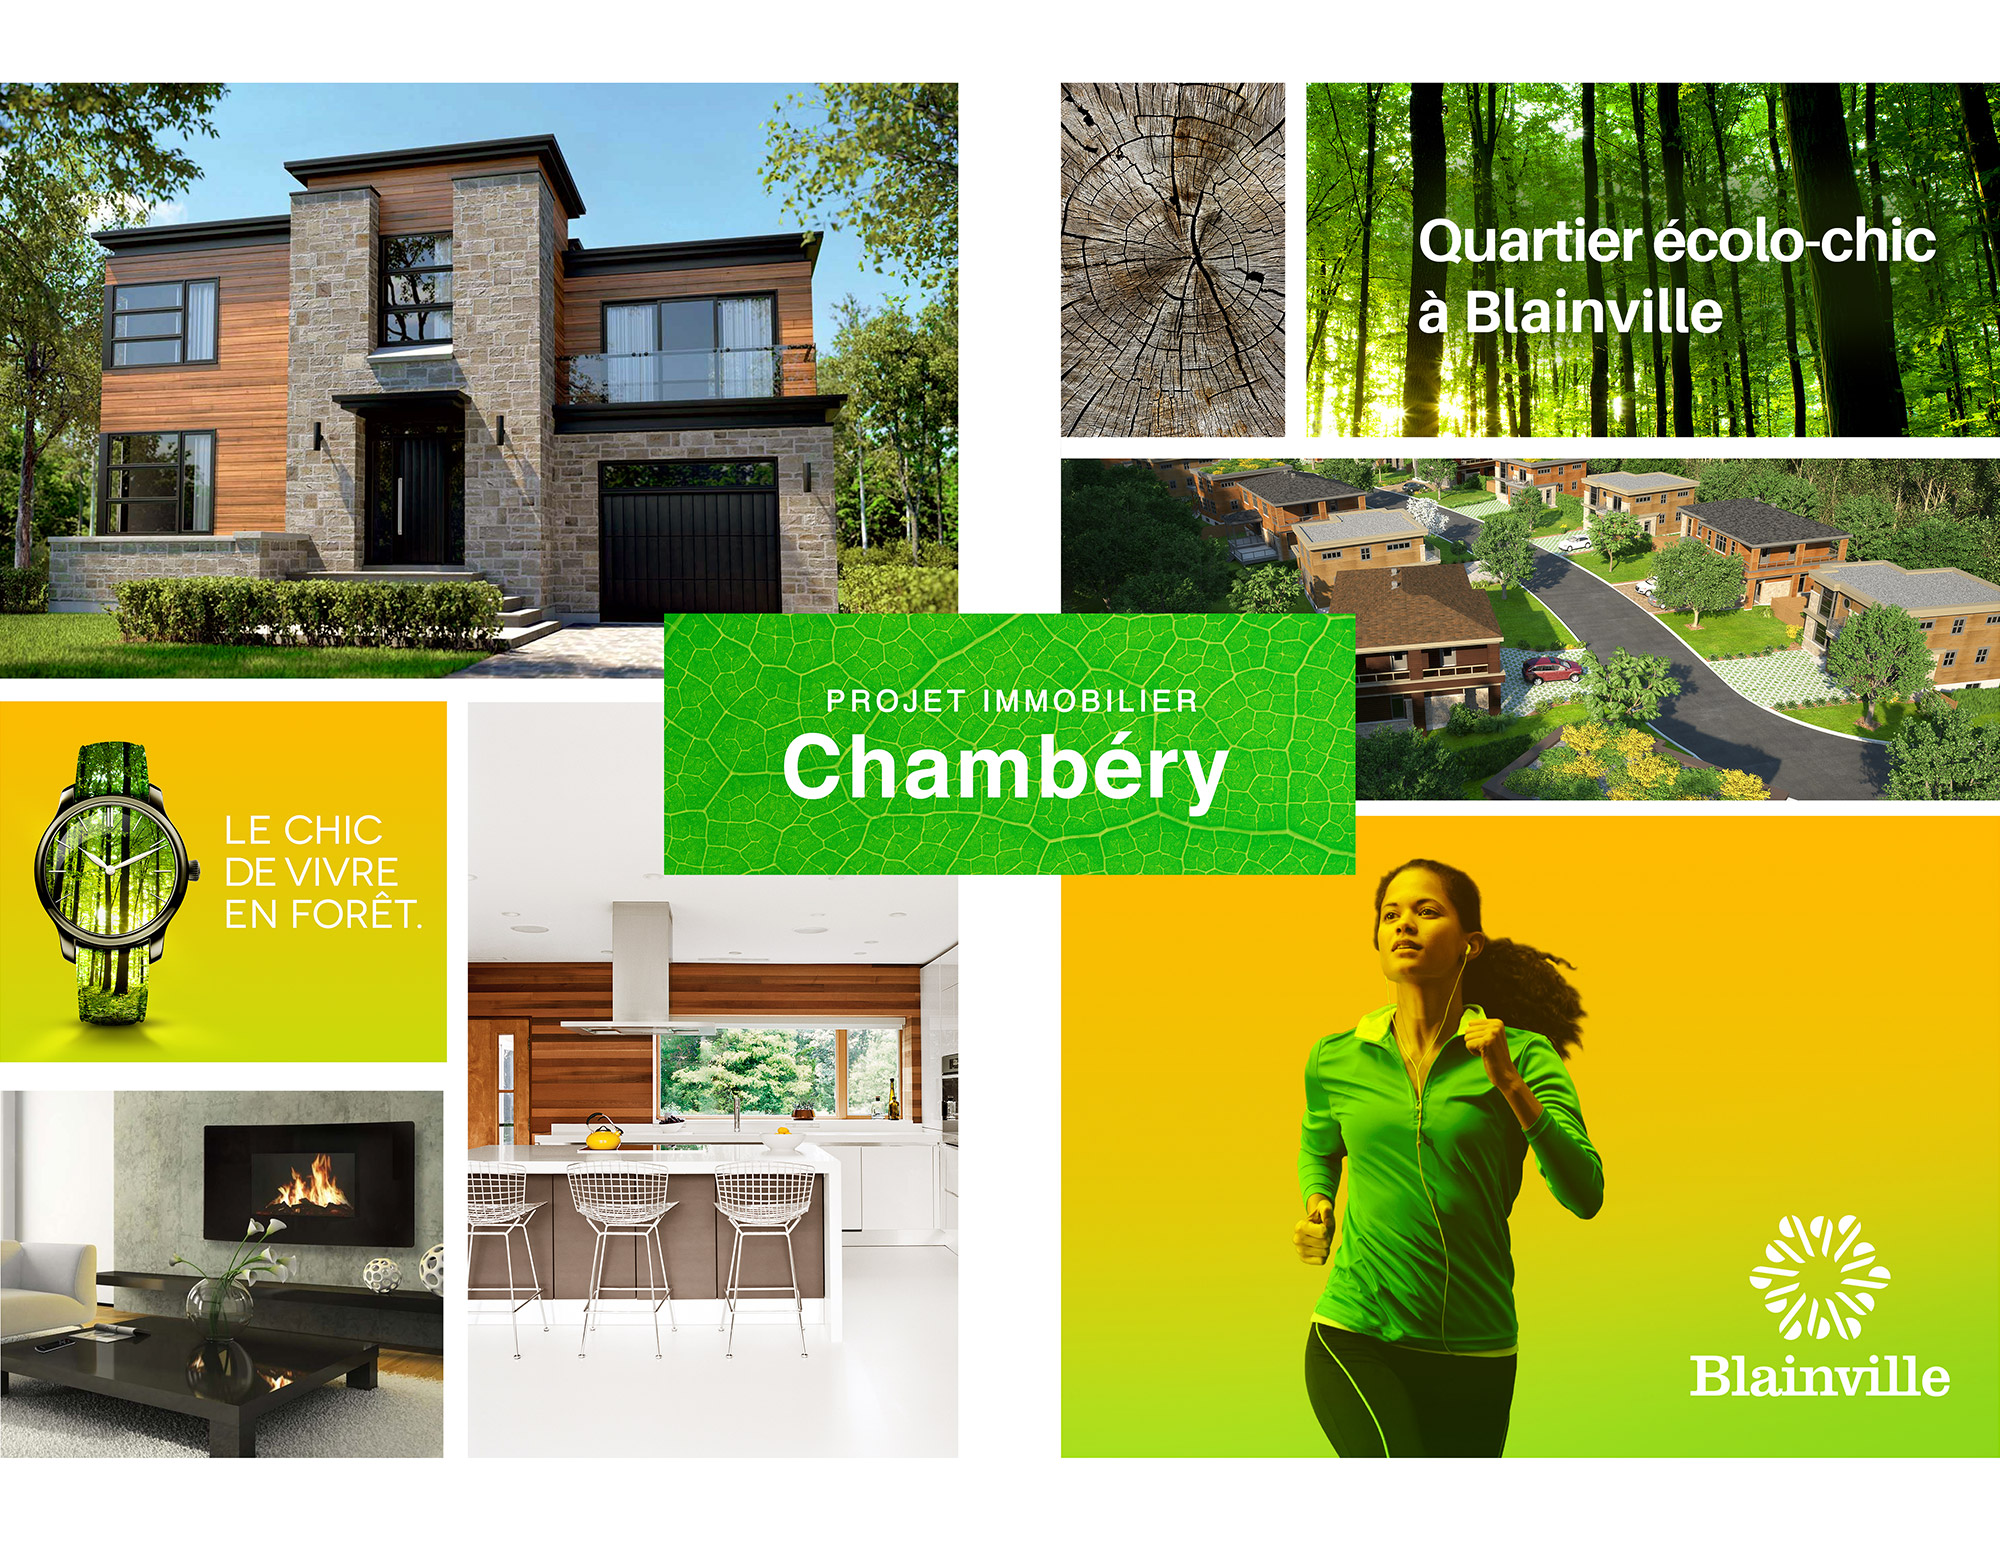 Blainville's Eco-chic Neighbourhood